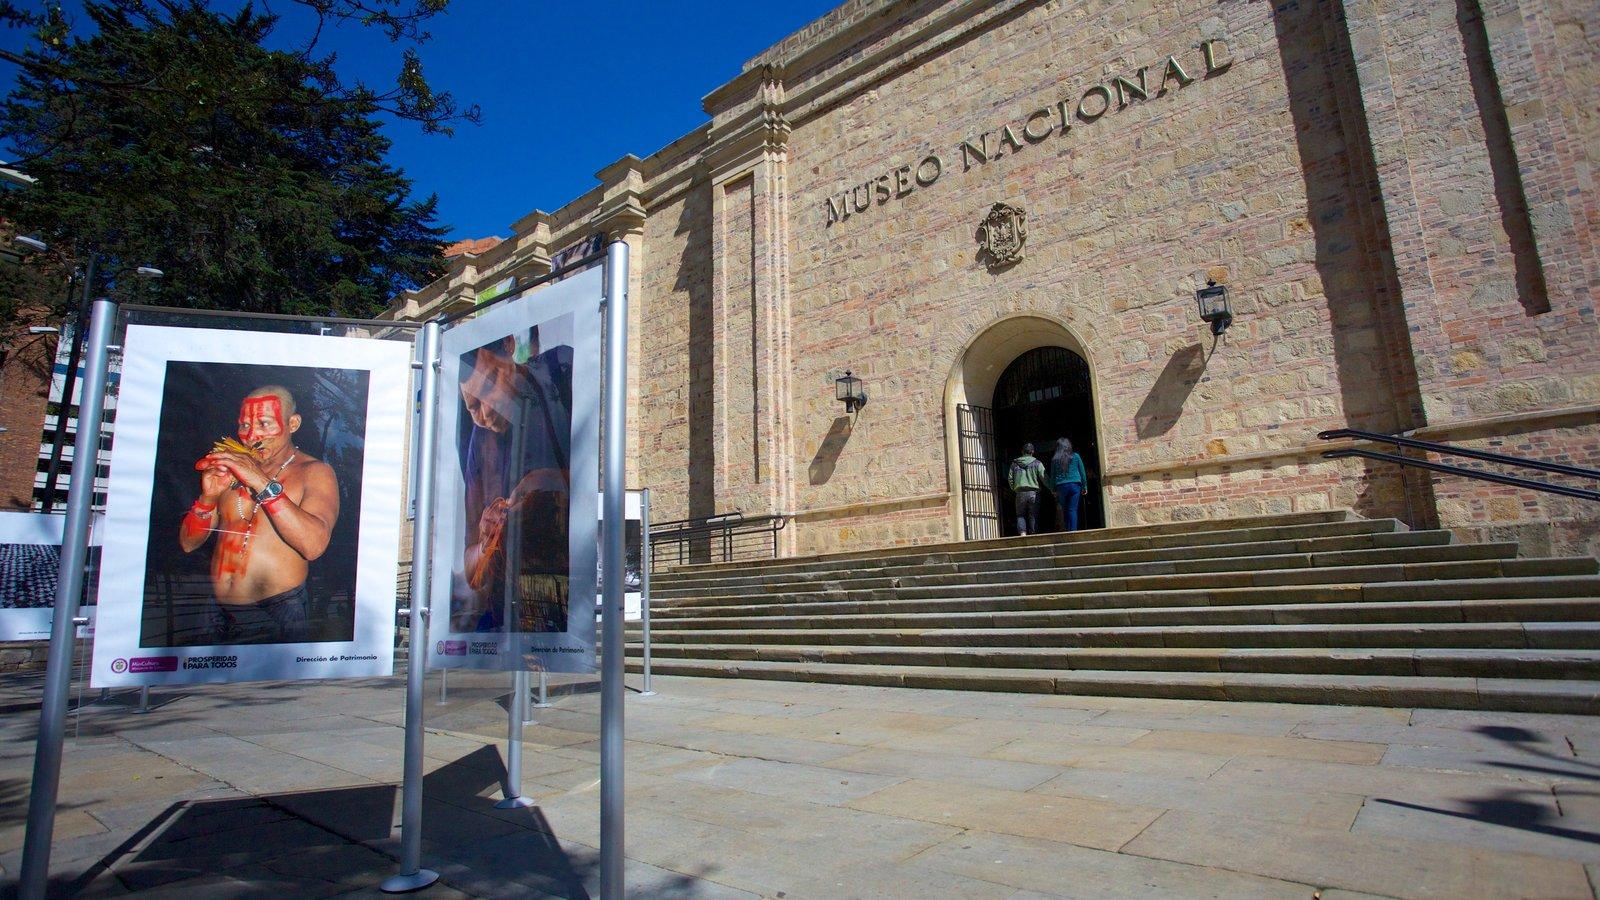 Museu Nacional caracterizando arte e elementos de patrimônio